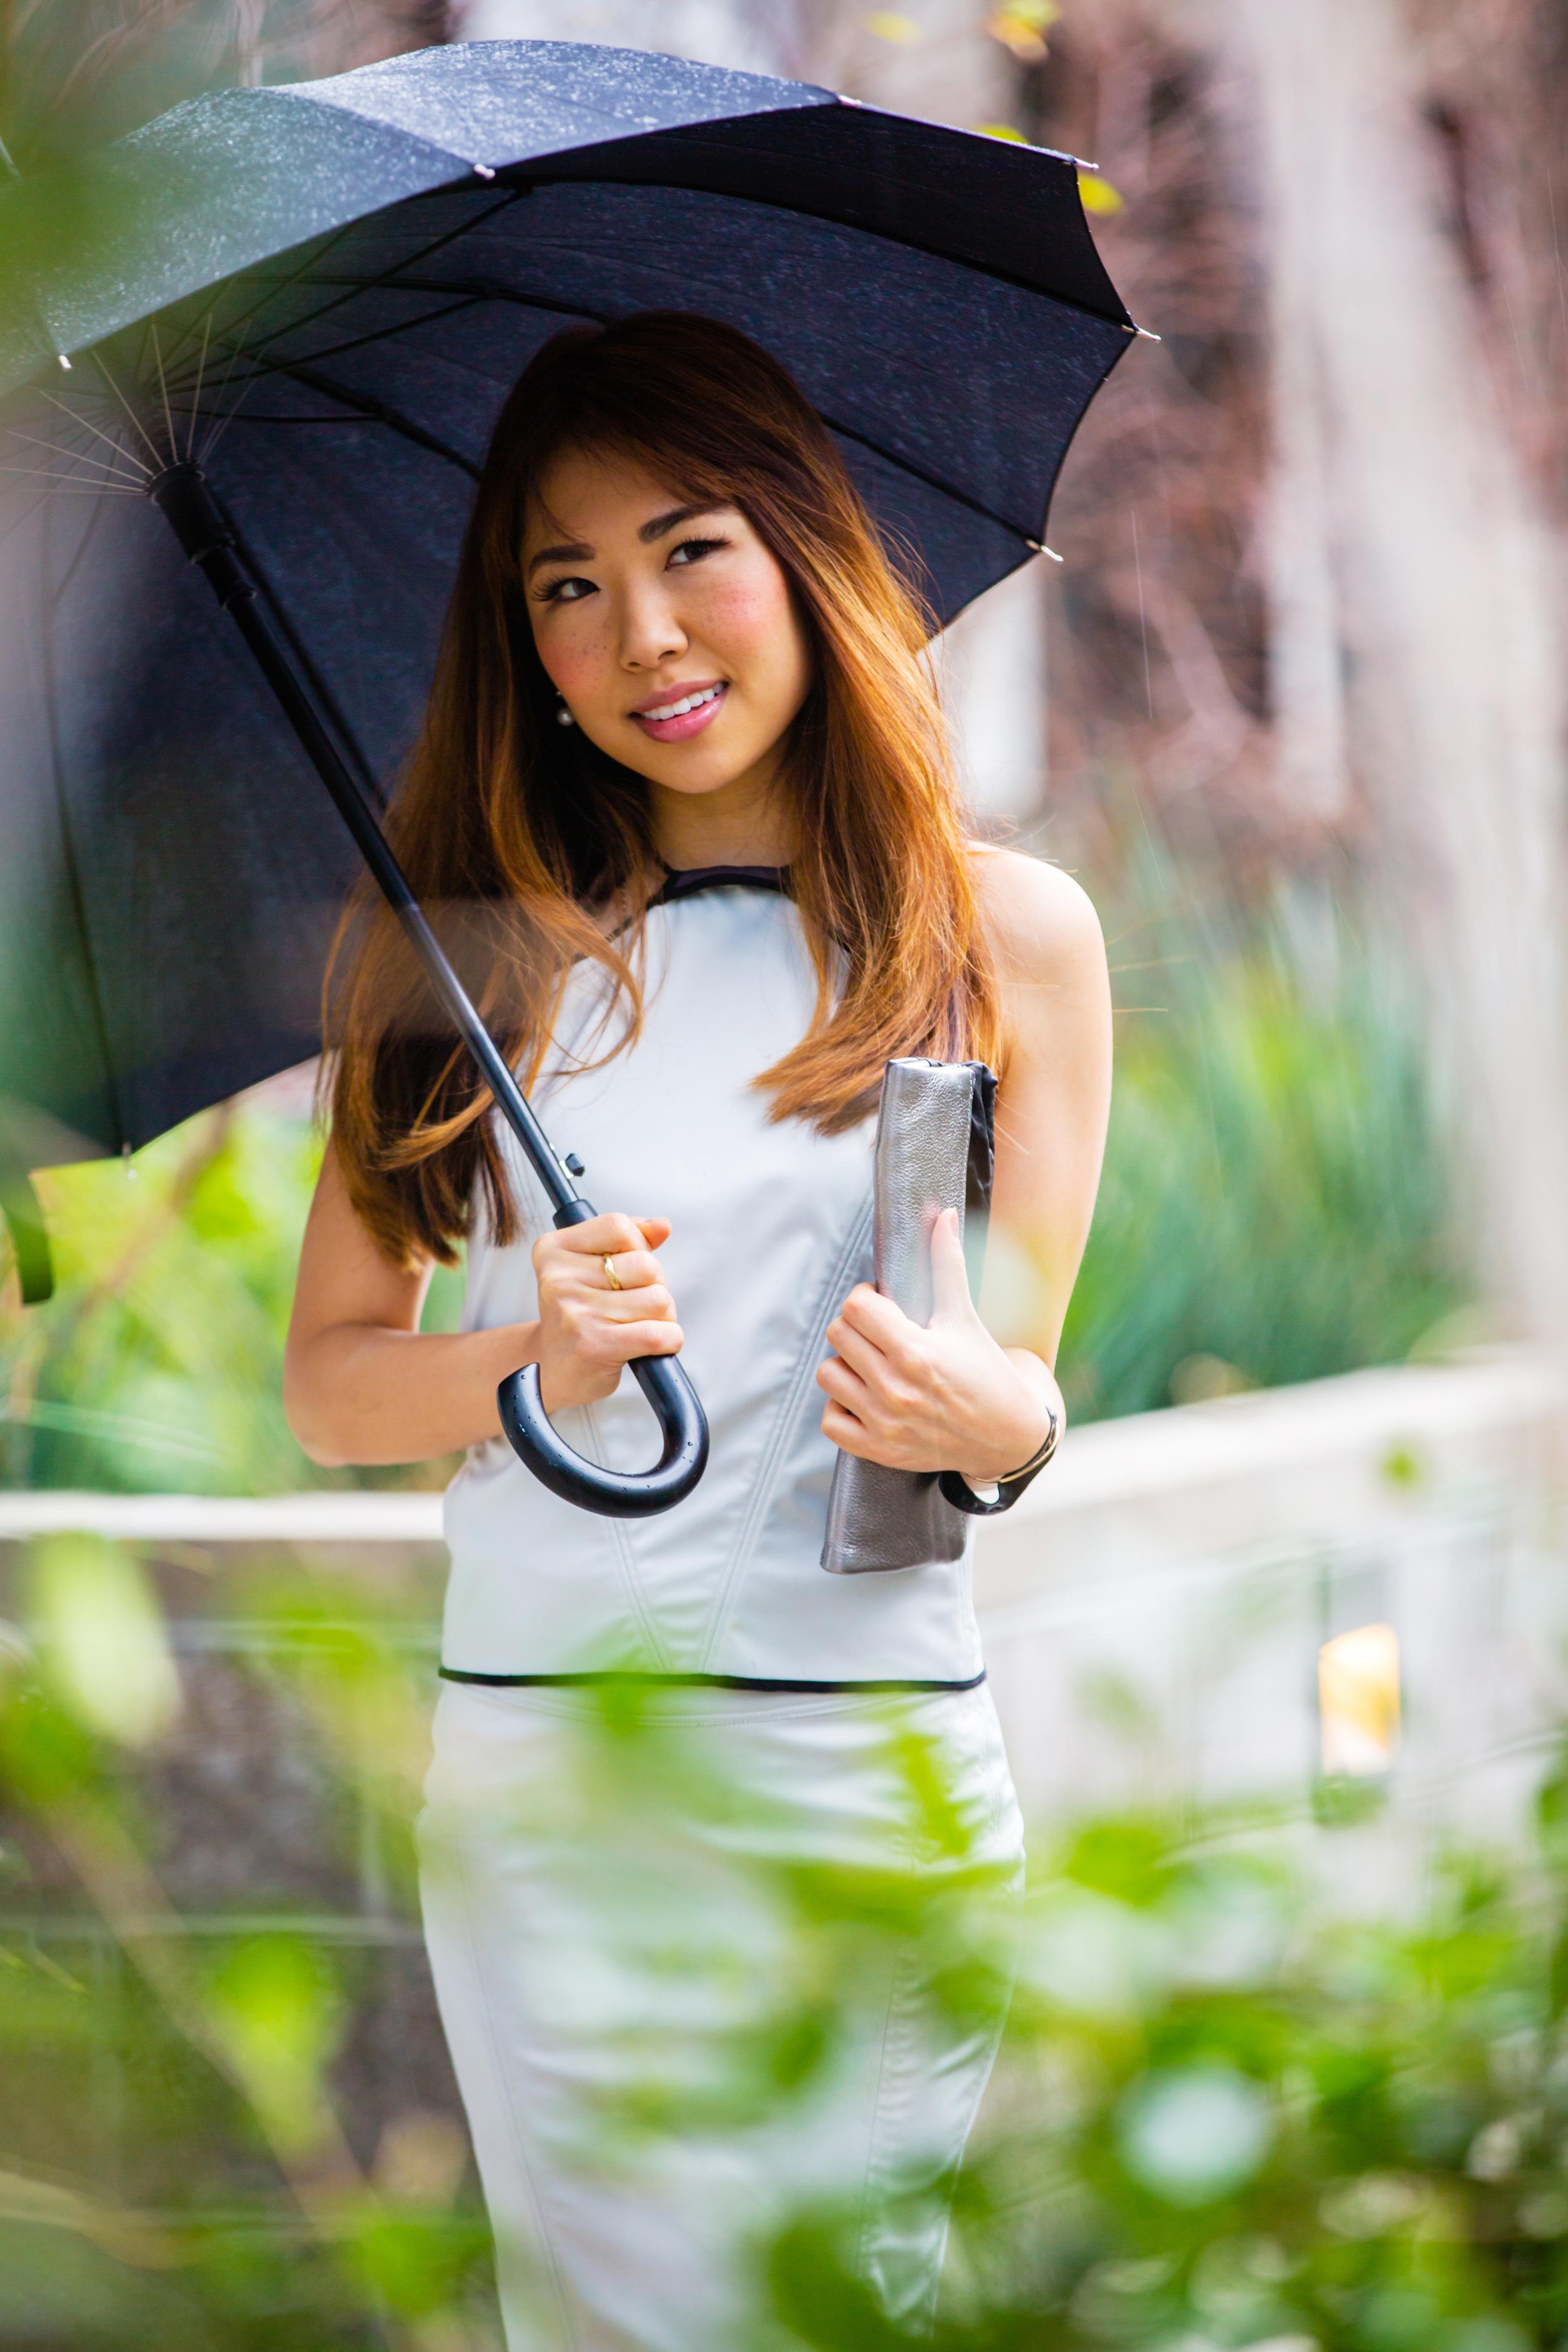 AW16 Zuria HalterTop & Brea Pencil Skirt (Reversible/Water Resistant)